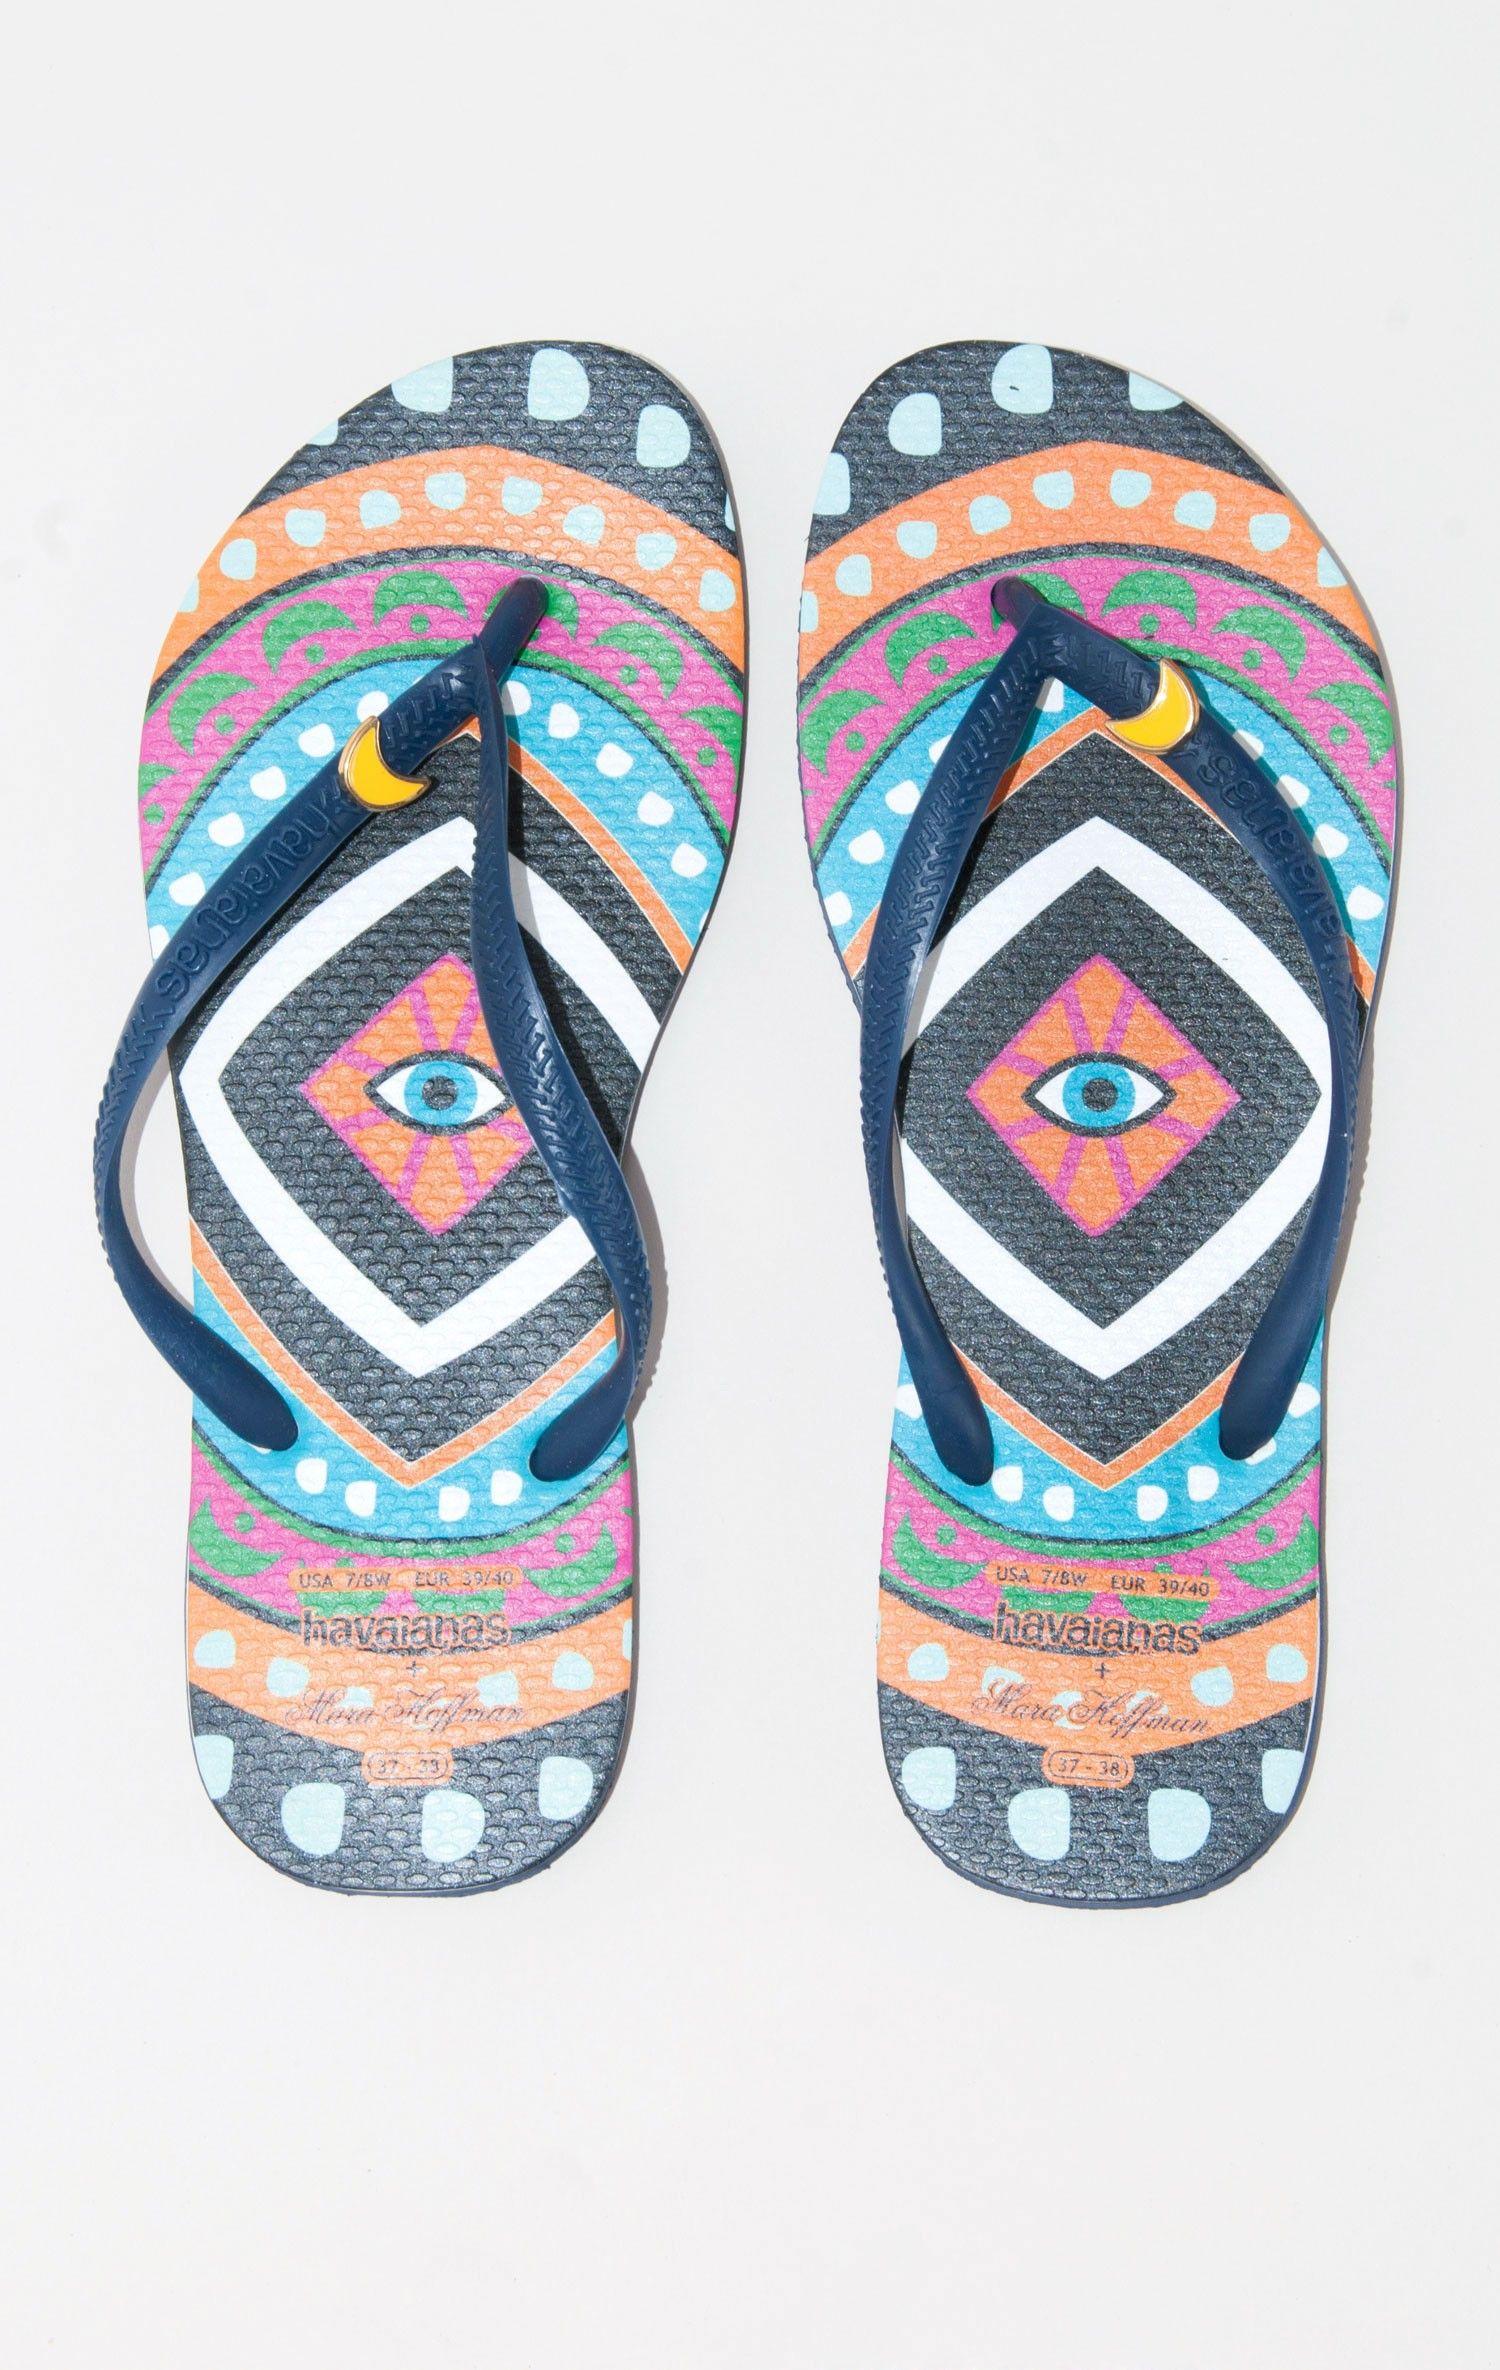 HAVAIANAS X MARA HOFFMAN sandals #planetblue #whatsnew